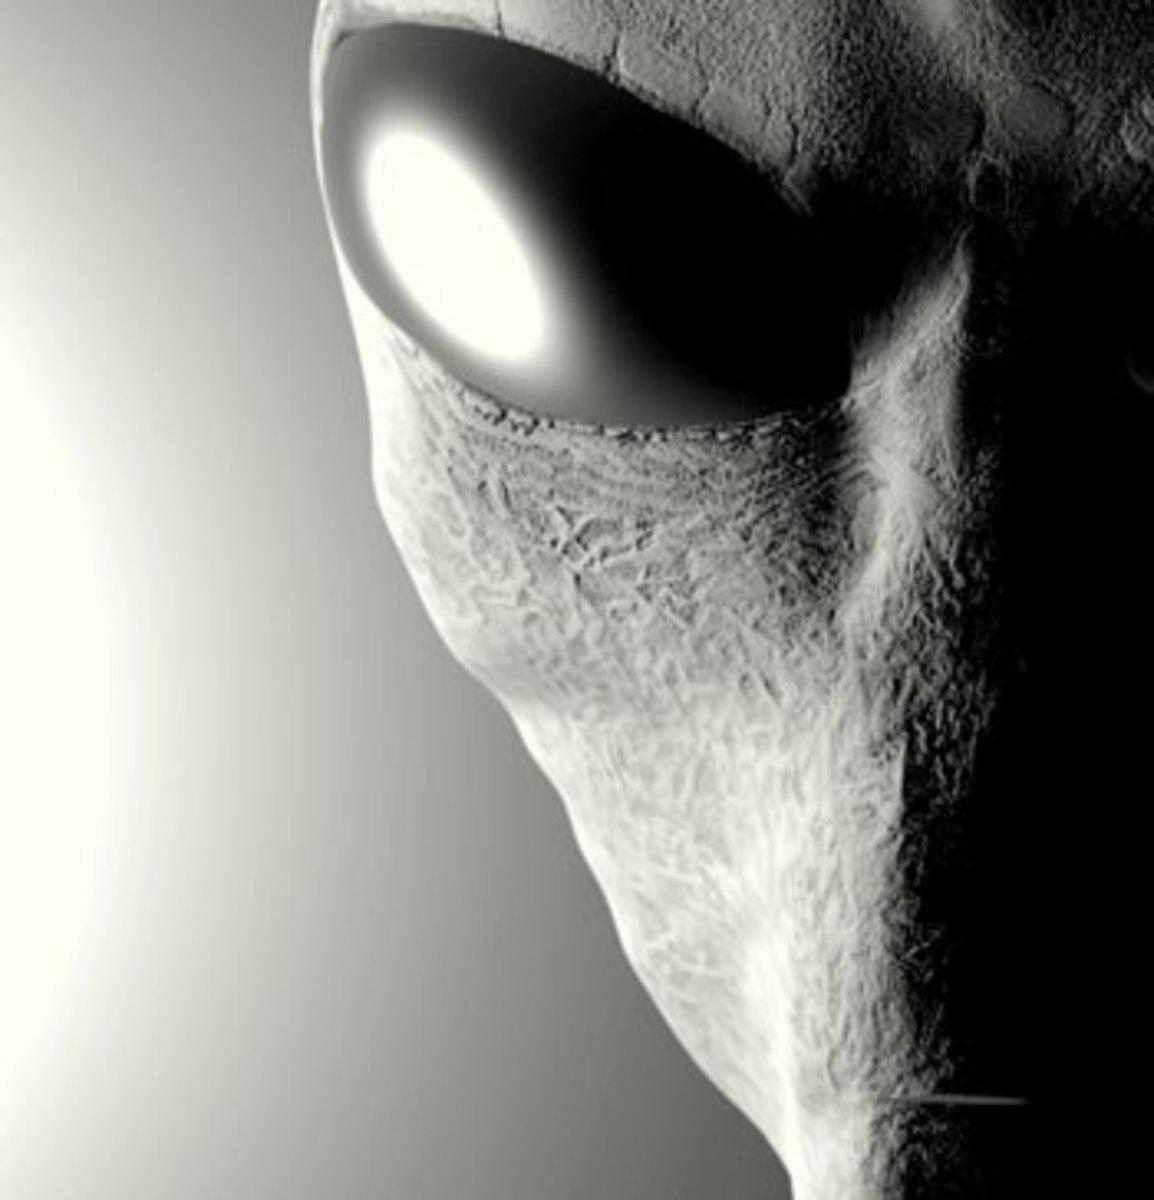 Alien Abduction & Contact